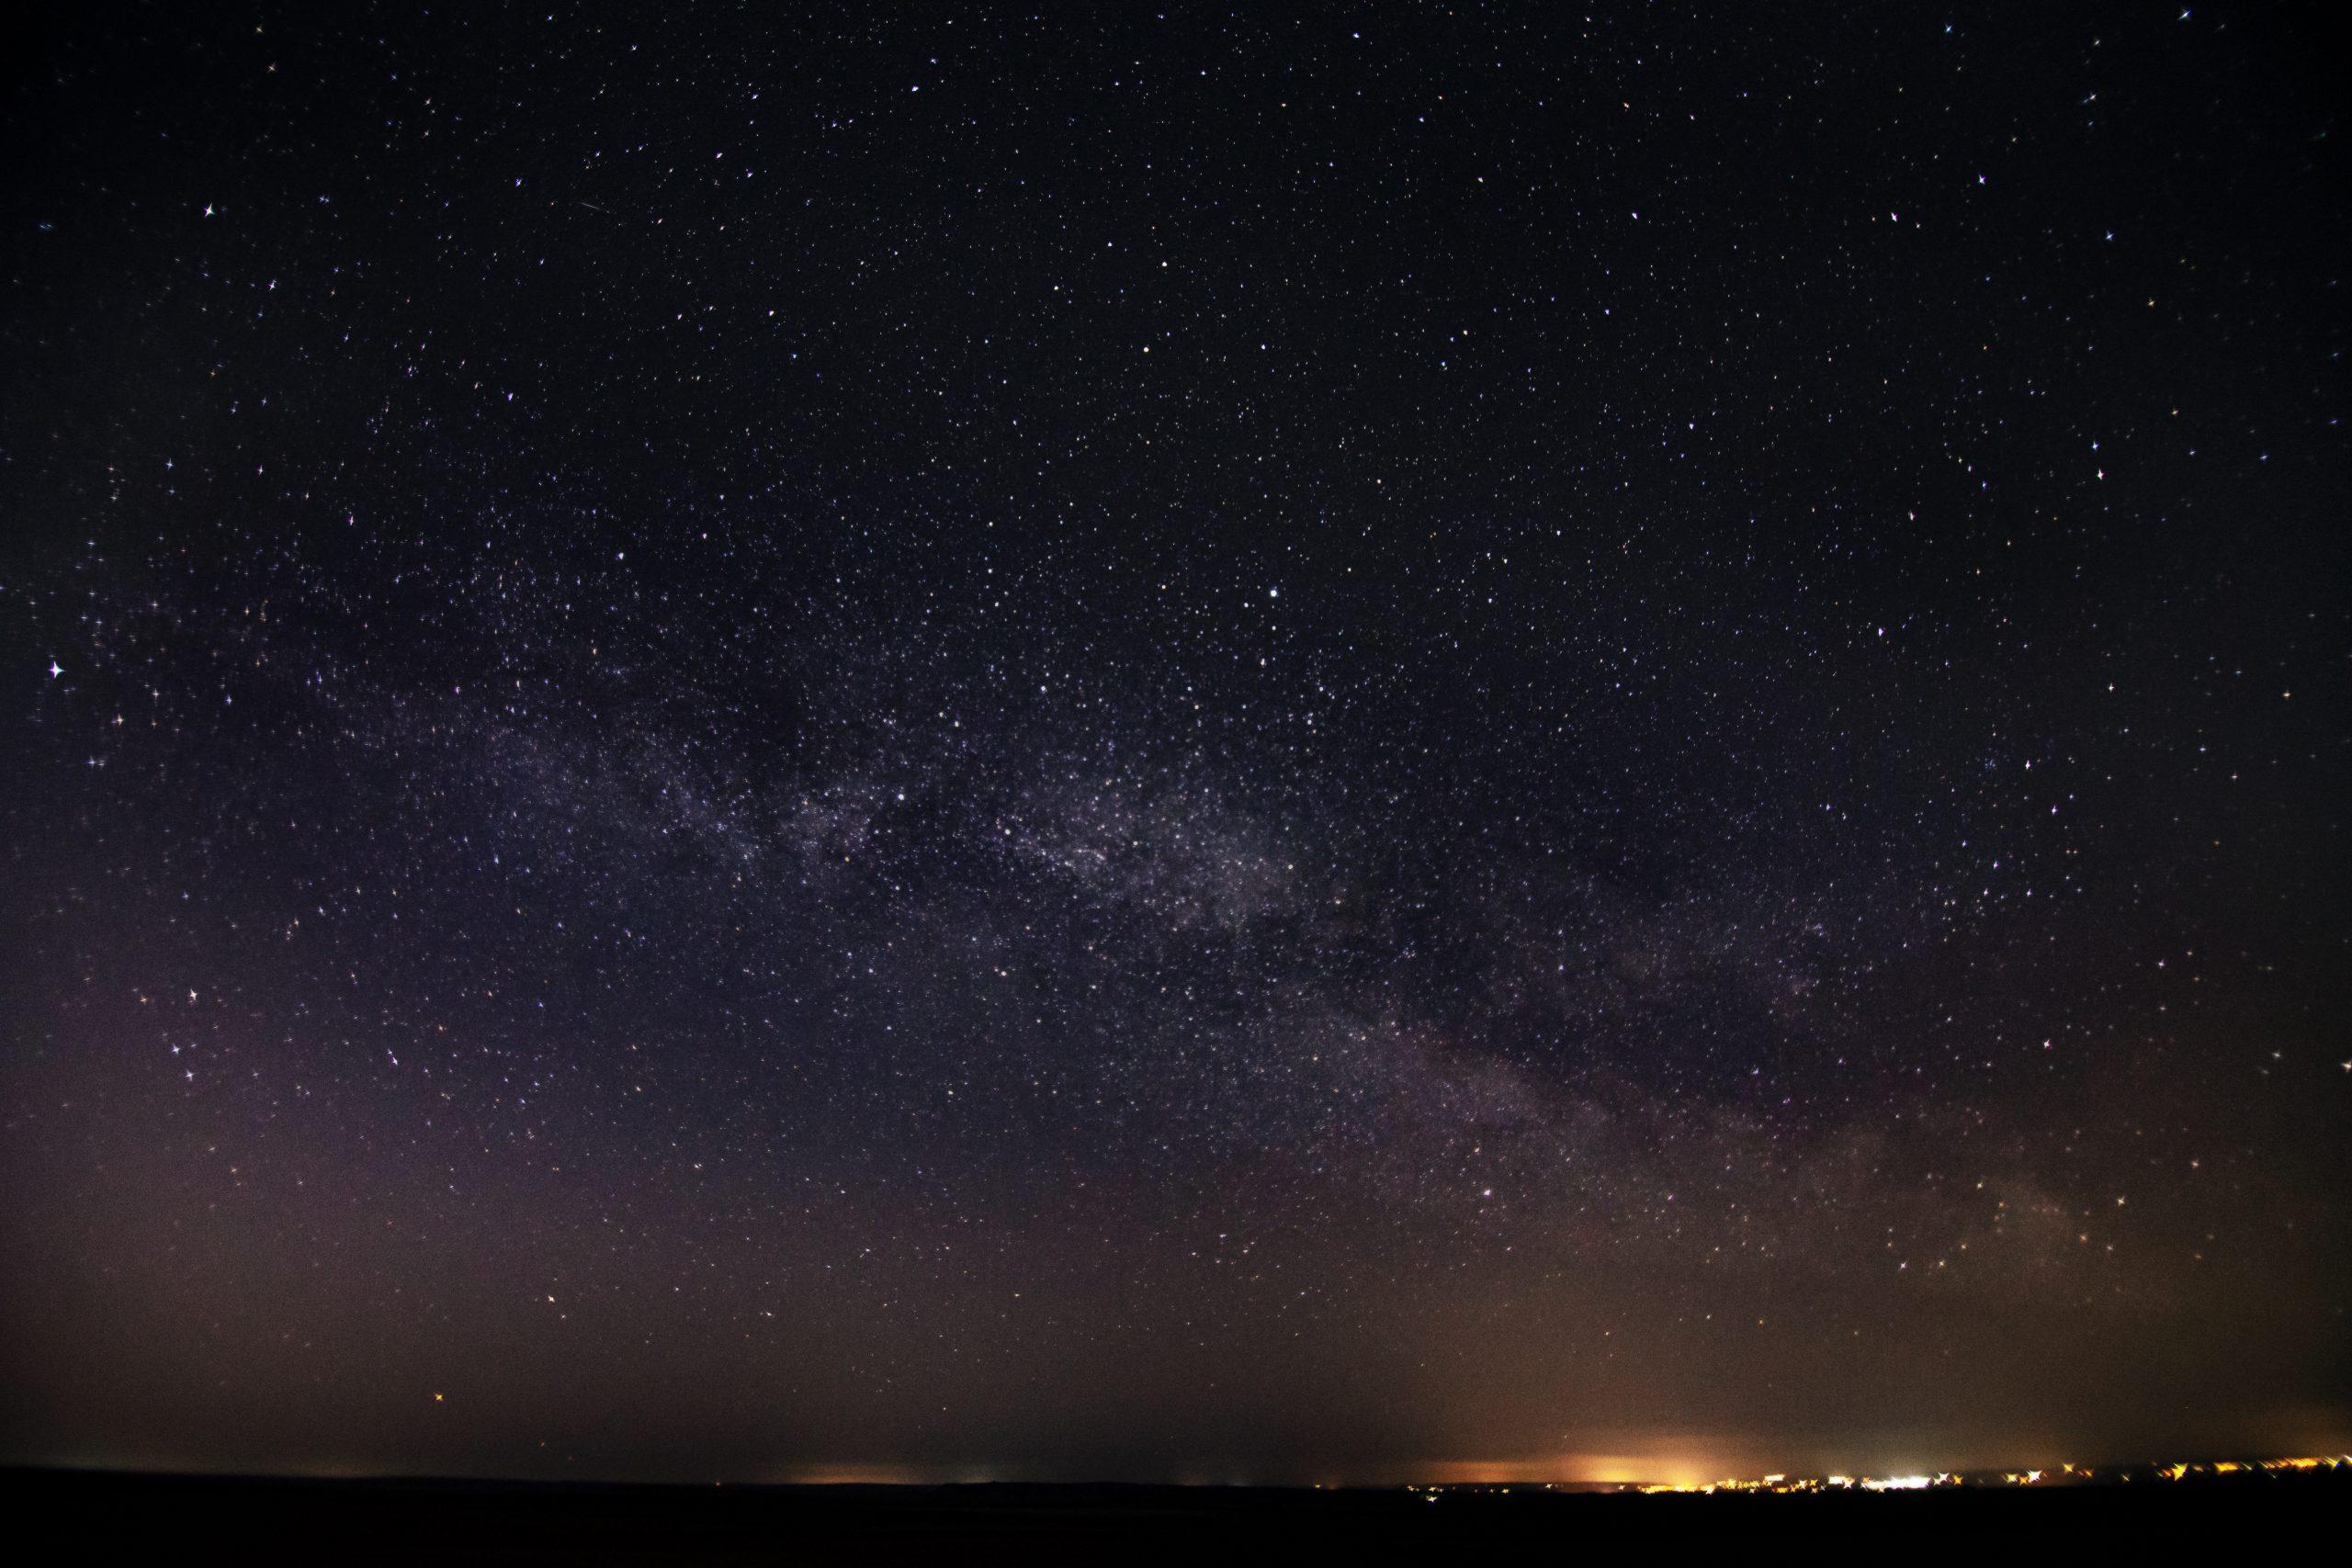 Milkyway over England